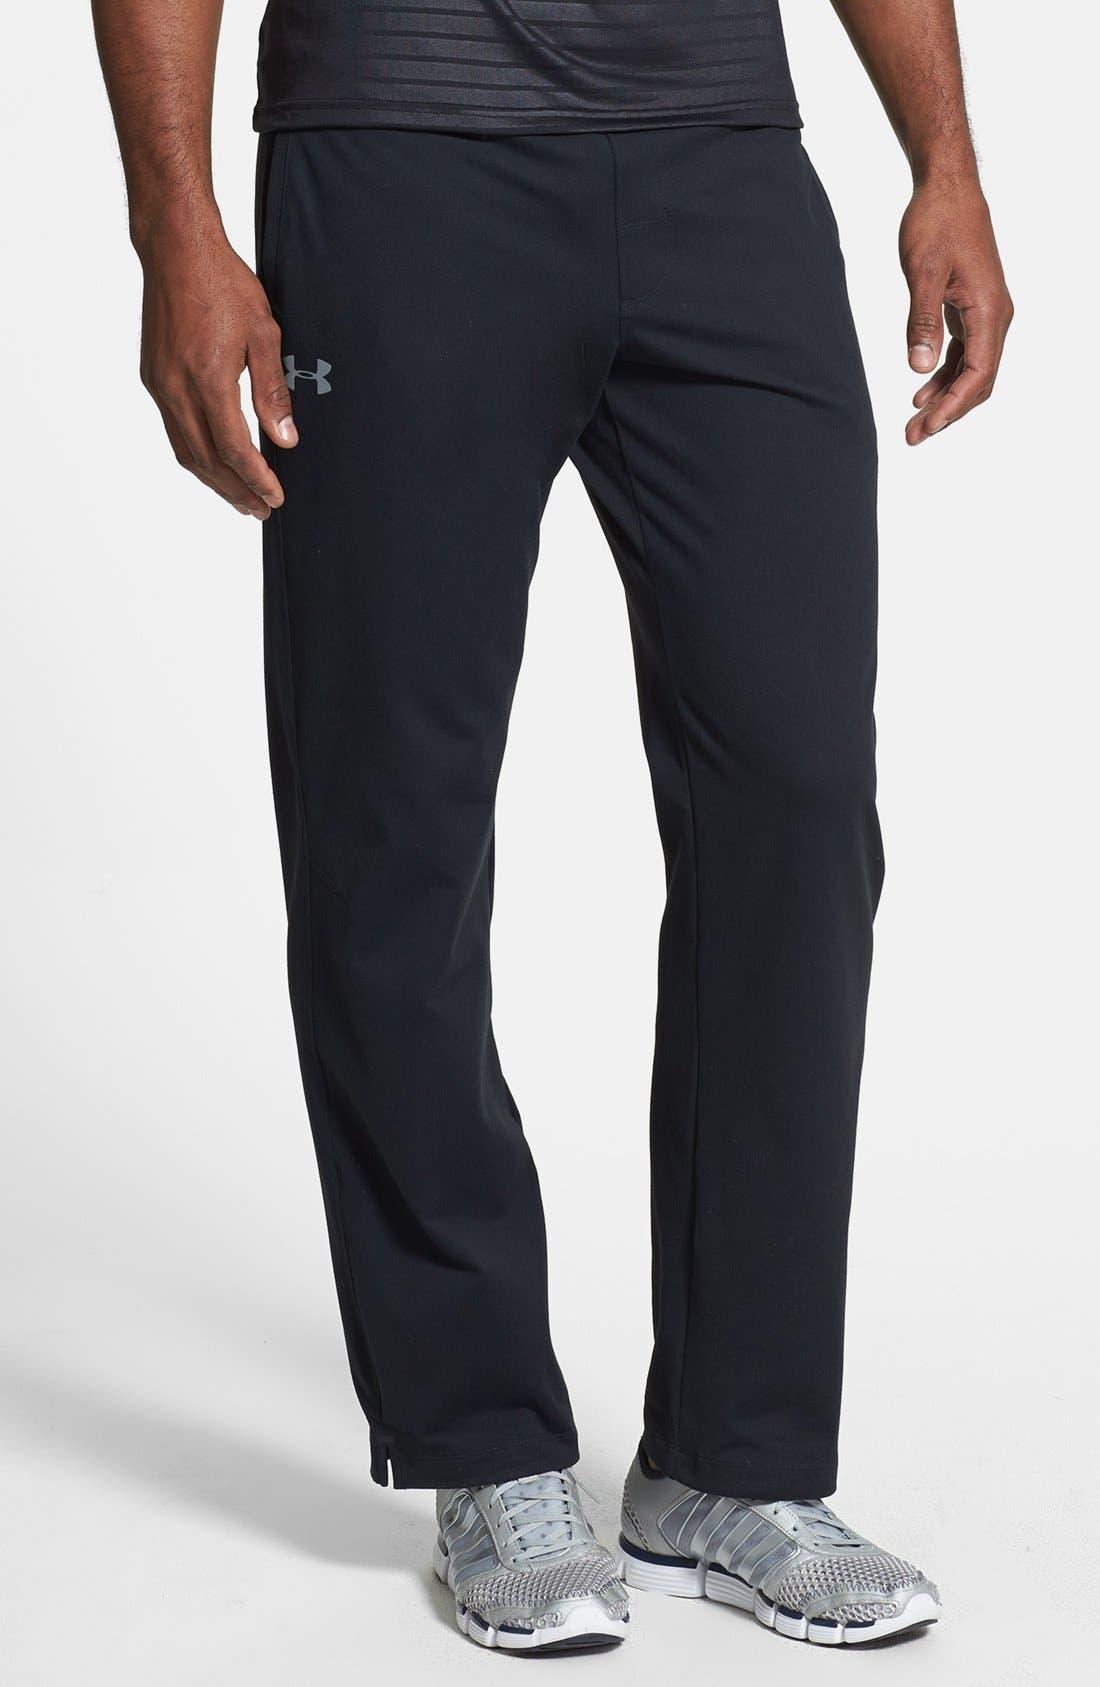 Alternate Image 1 Selected - Under Armour 'X-Alt' Fleece Pants